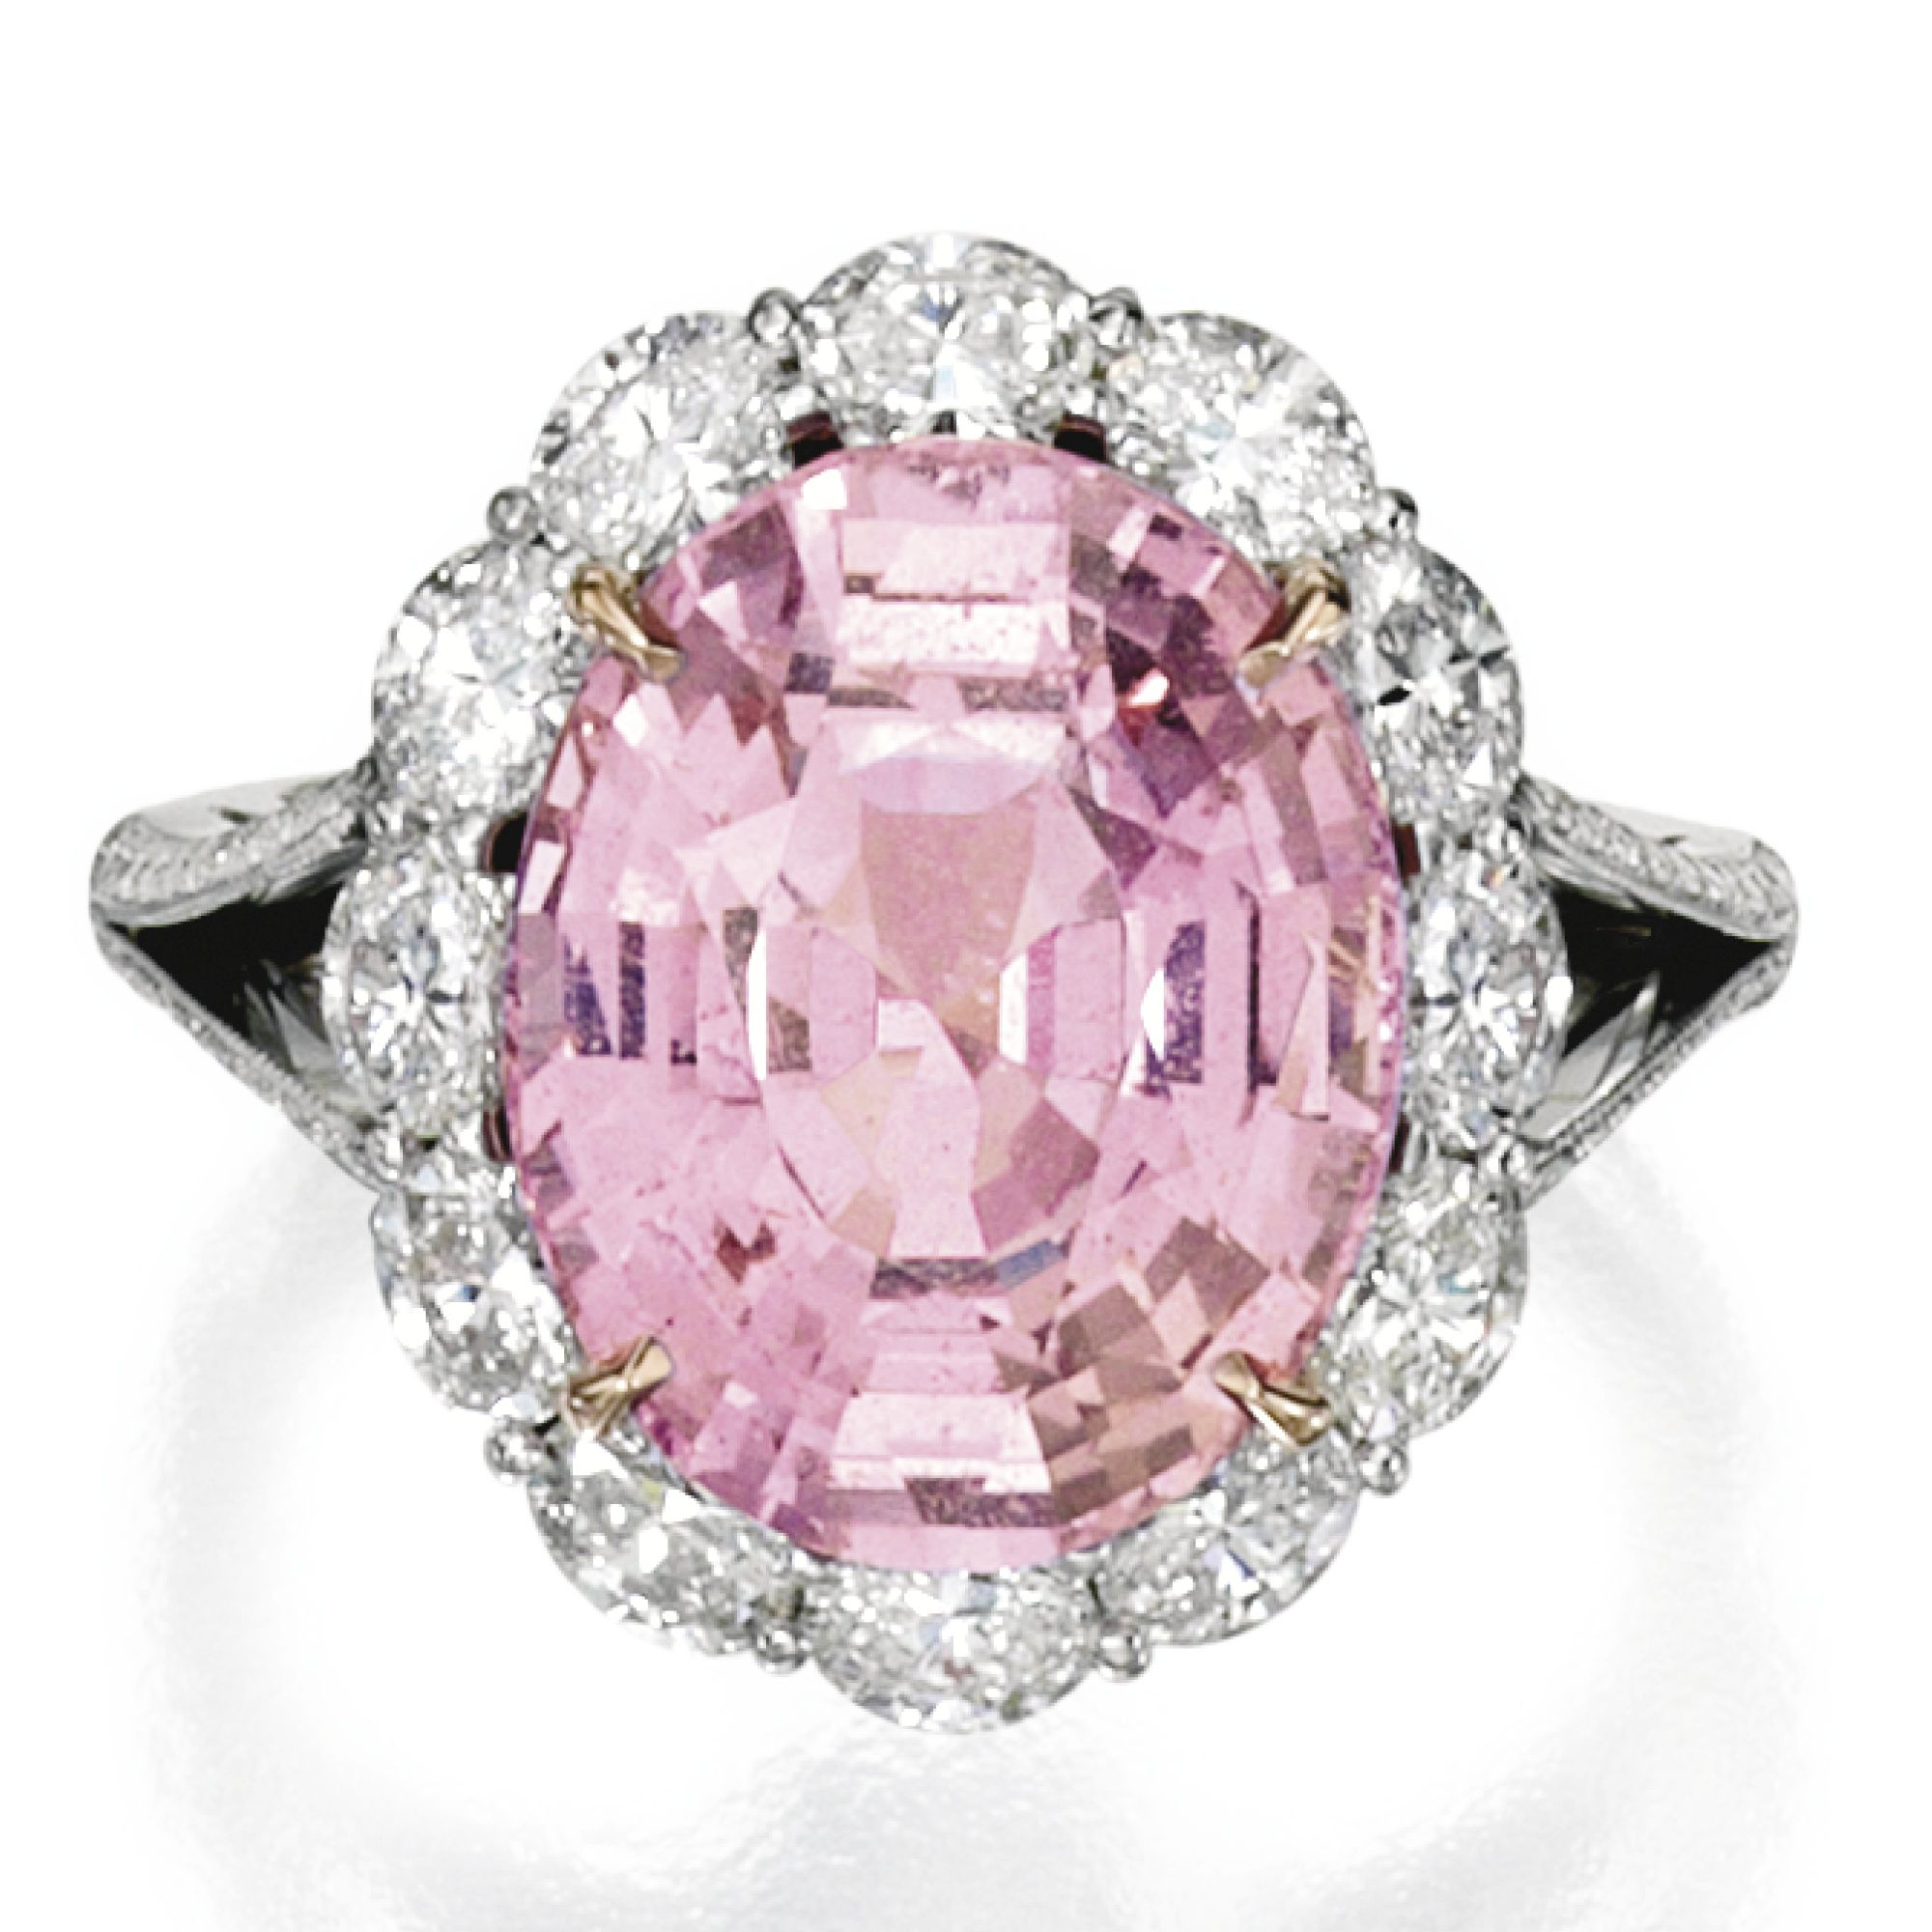 PLATINUM, 18 KARAT ROSE GOLD, PADPARADSCHA SAPPHIRE AND DIAMOND RING ...